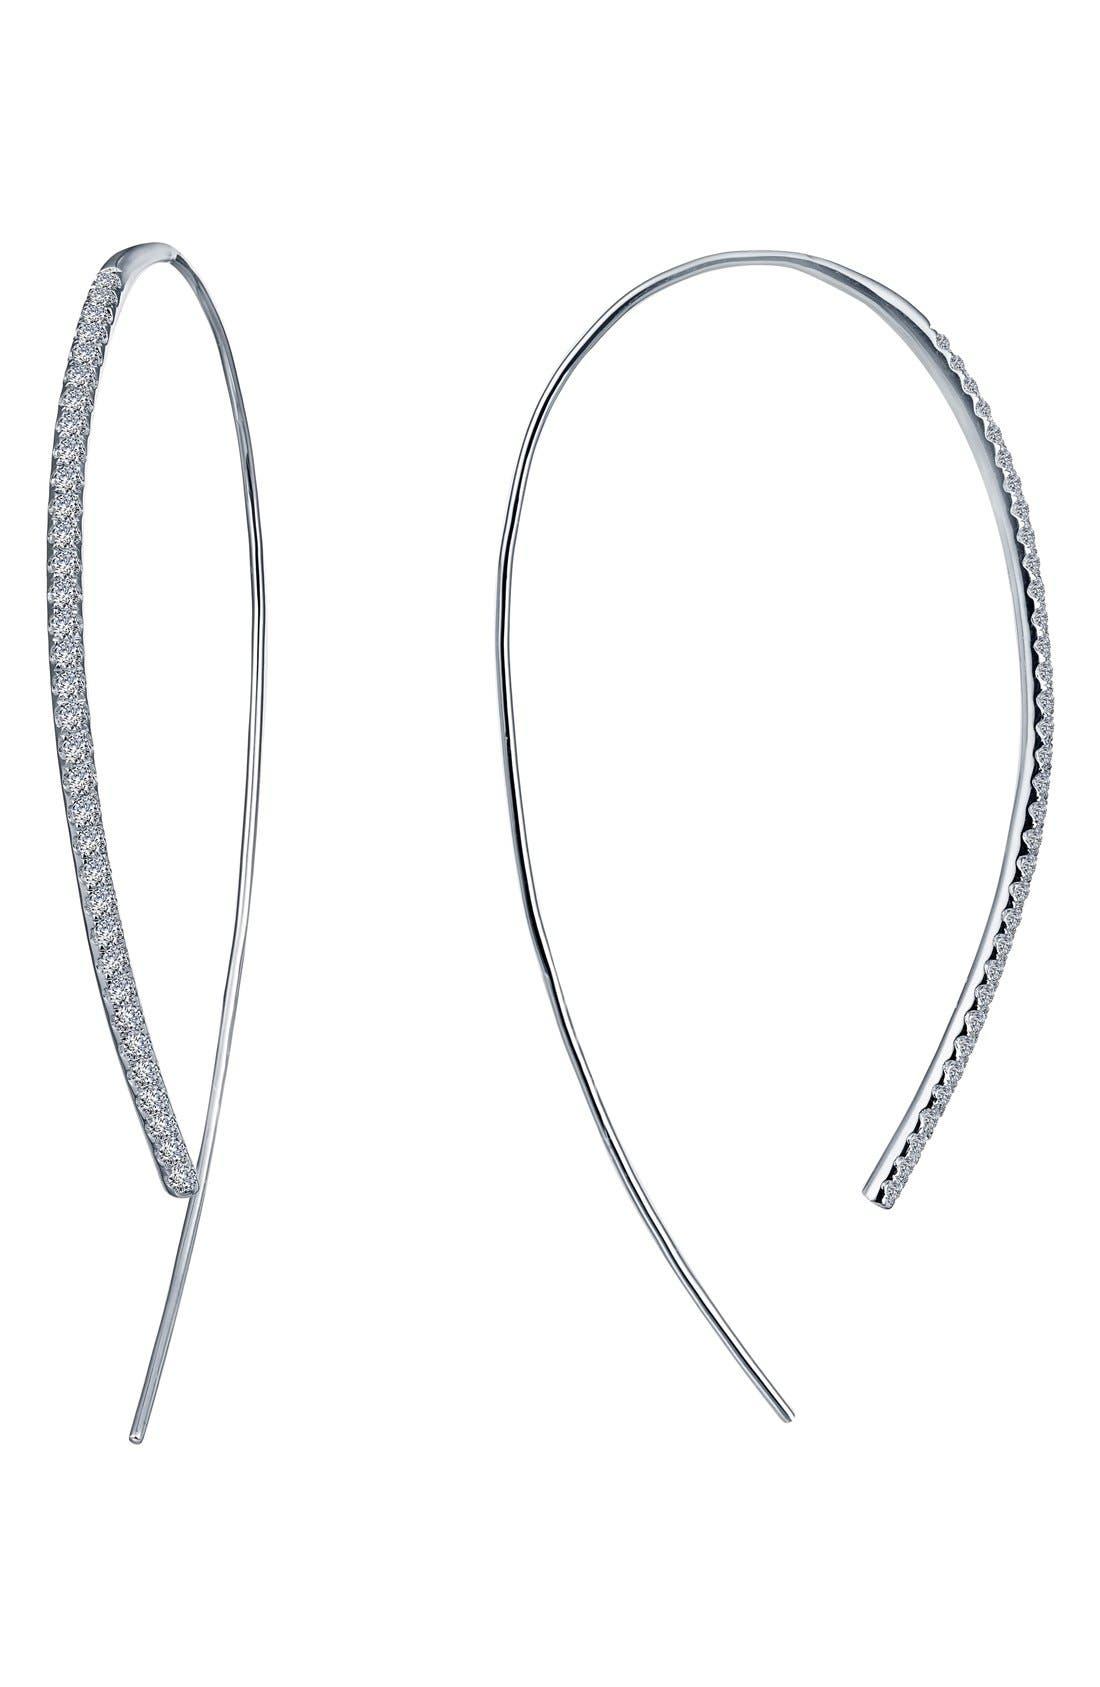 Alternate Image 1 Selected - Lafonn Open Hoop Threader Earrings